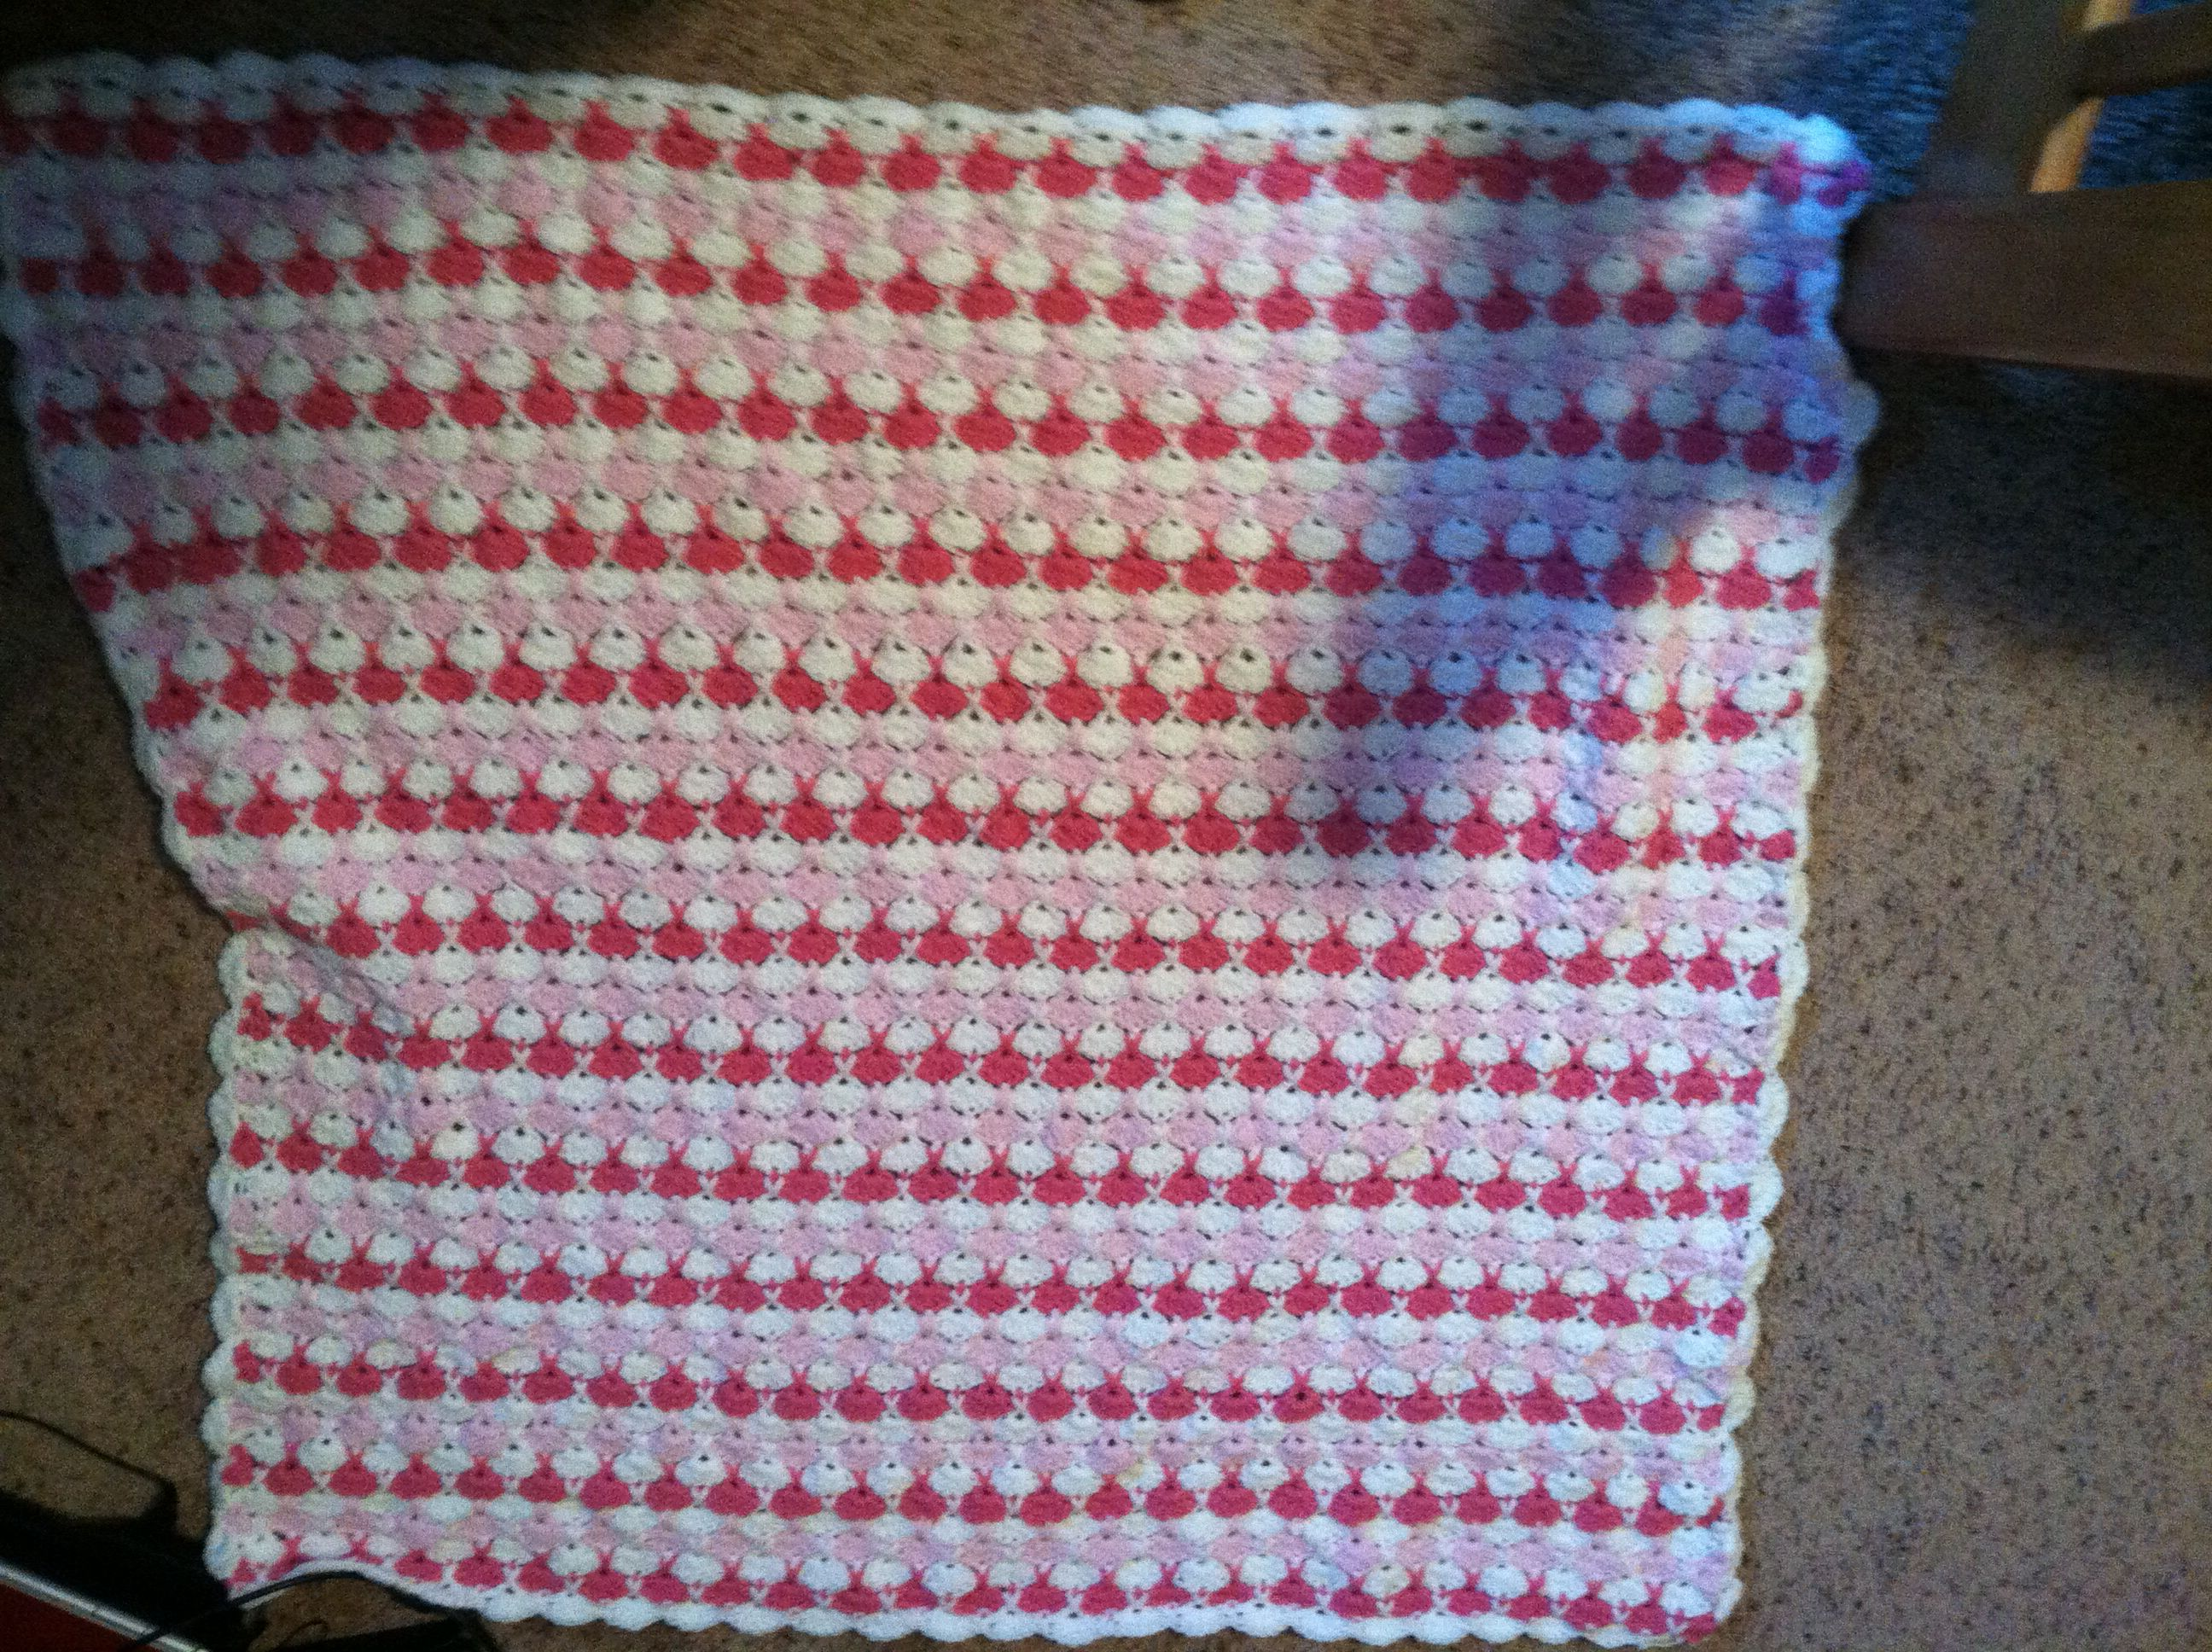 Baby blanket for my granddaughter.